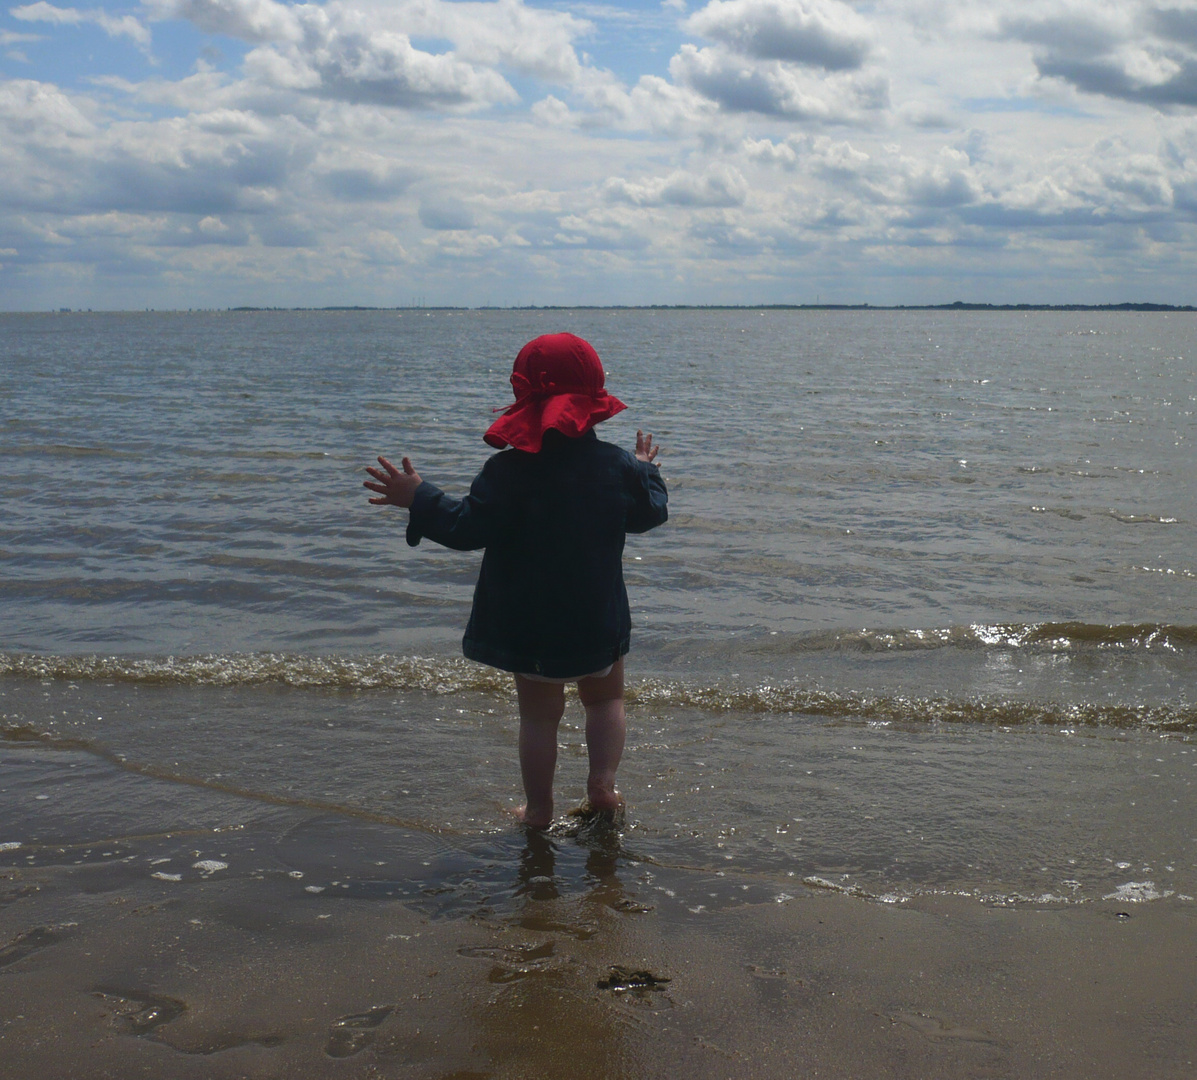 kleiner Mensch am Meer